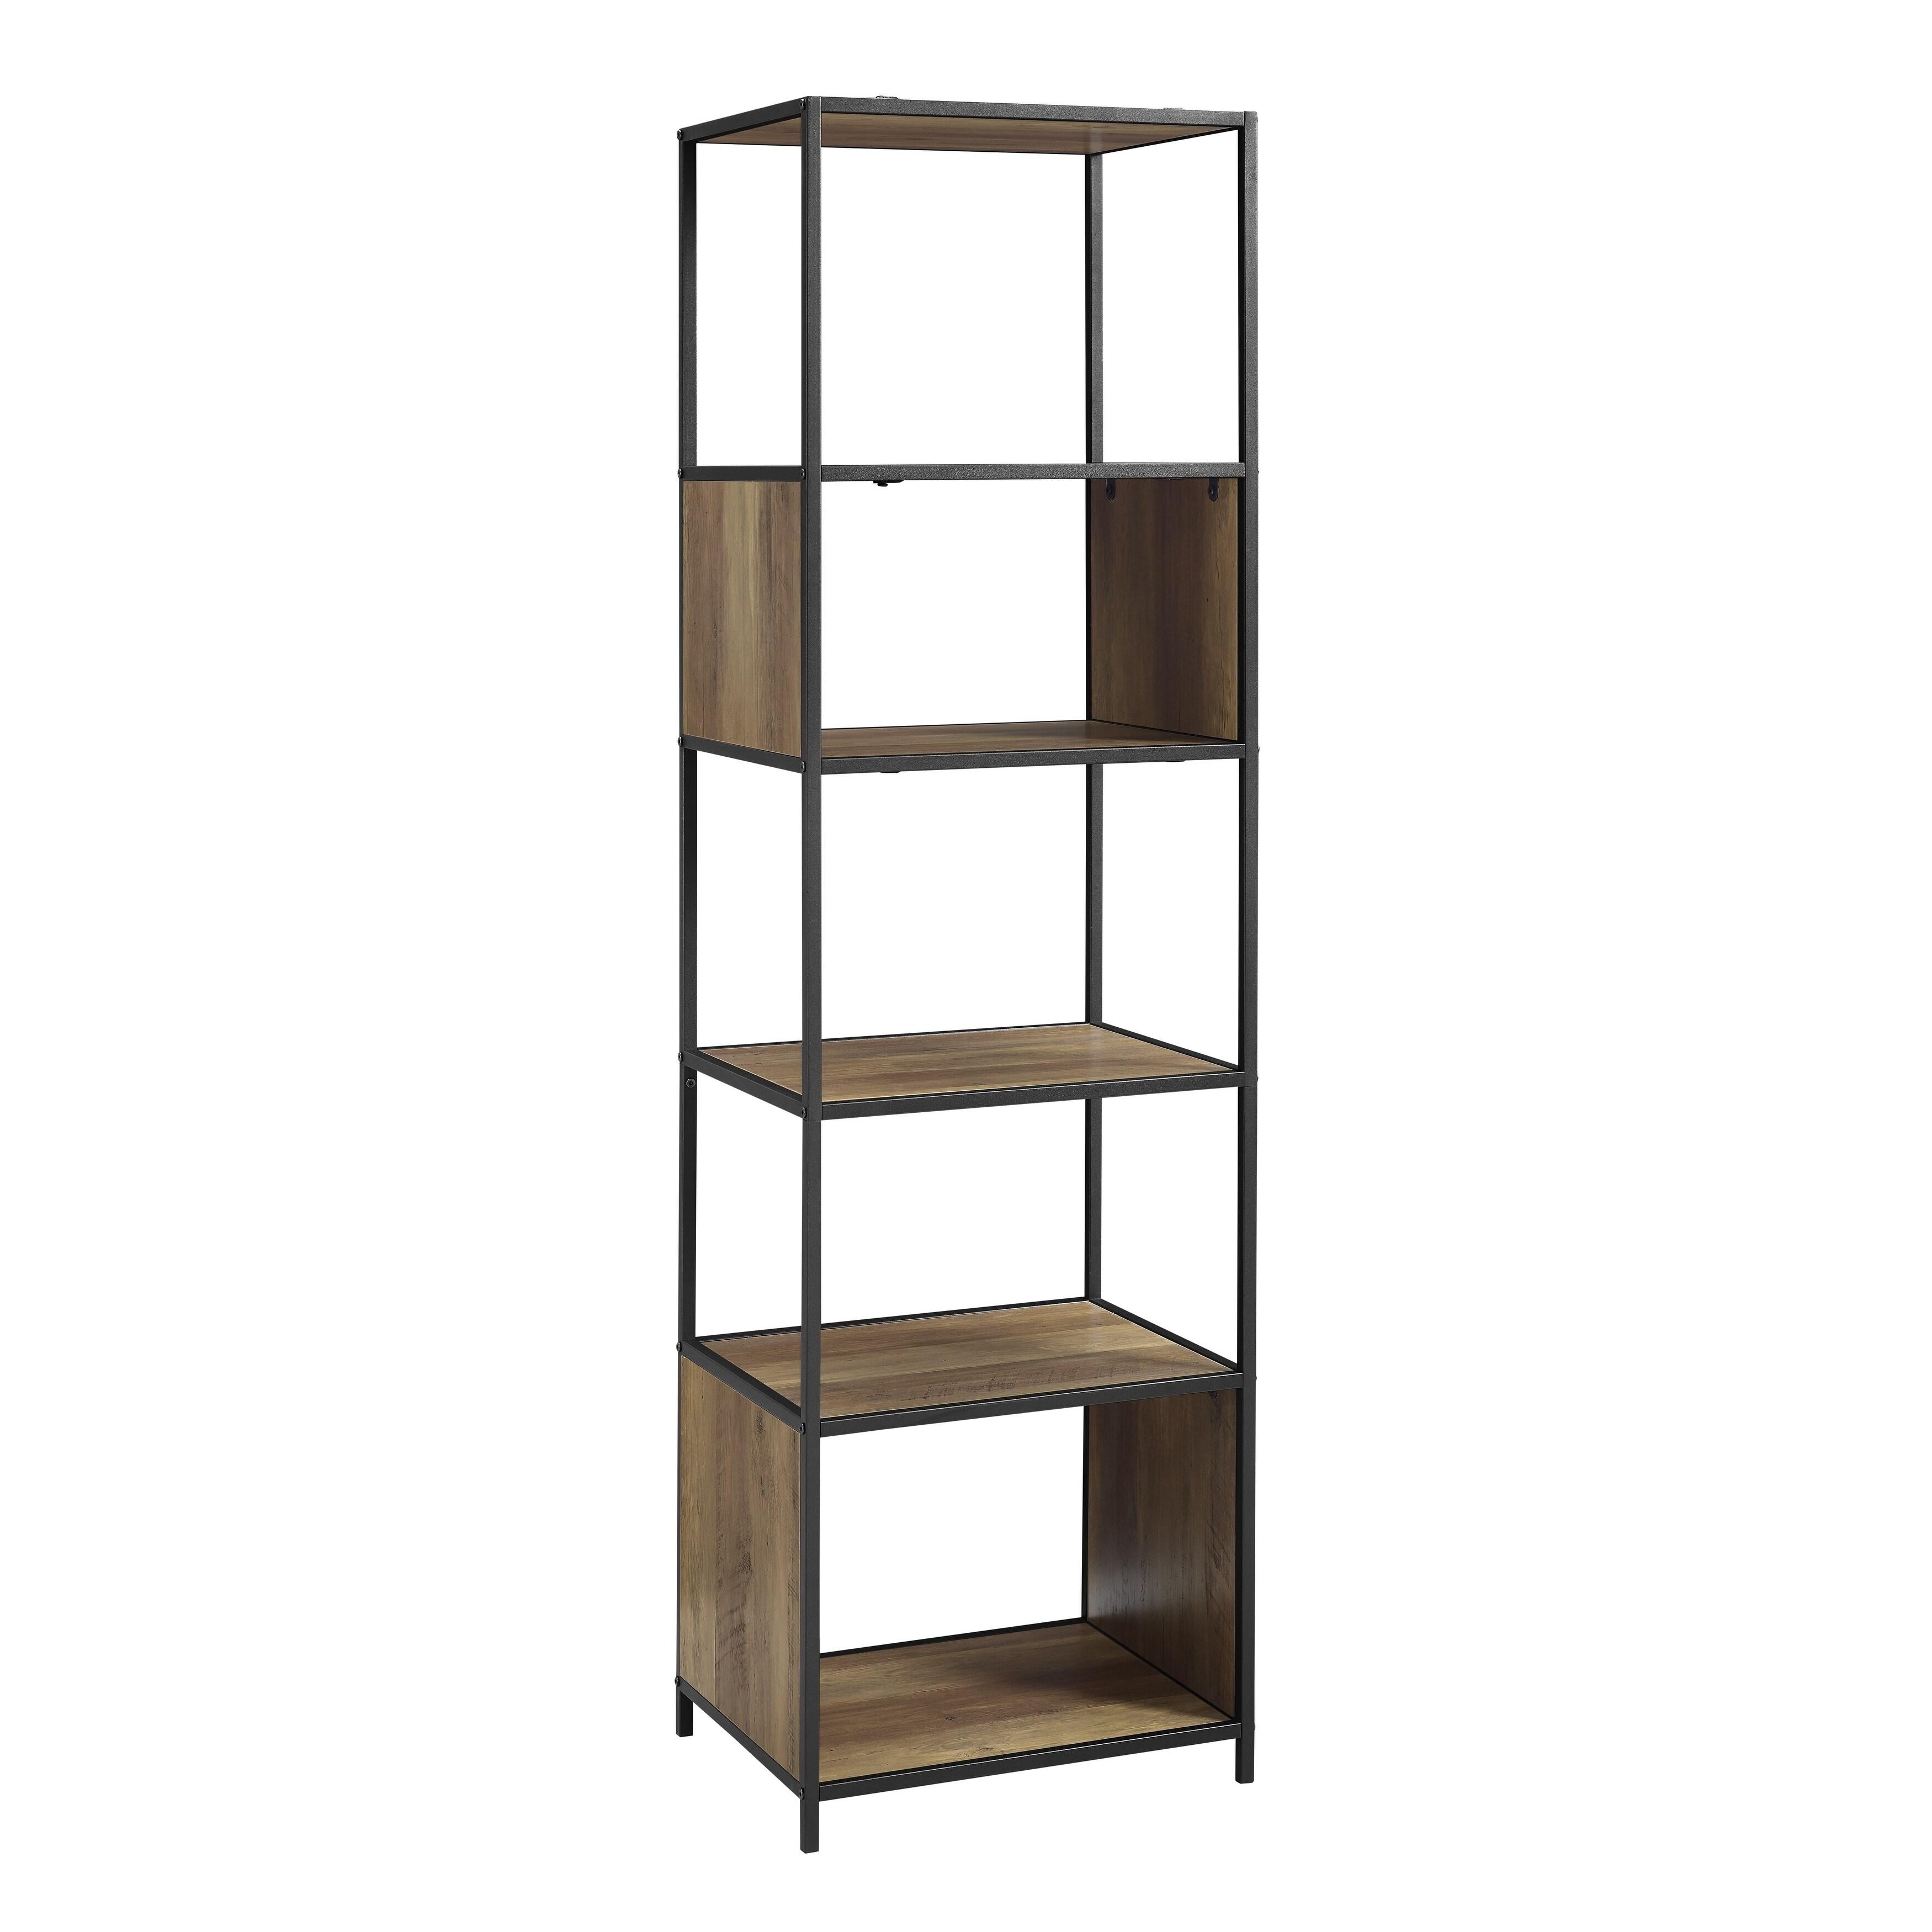 Shop 70 Tall Bookshelf Display Tower